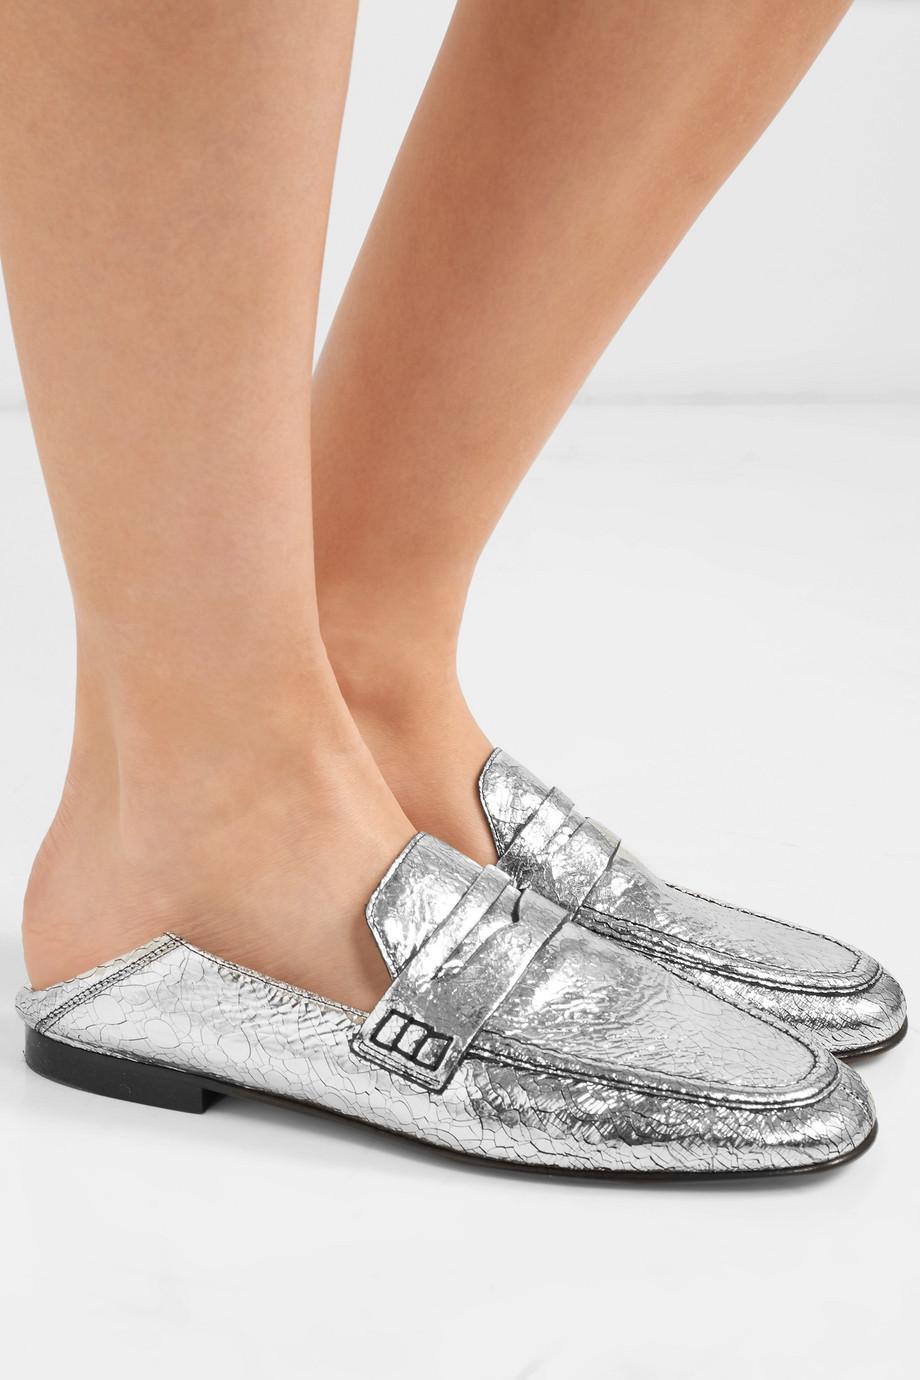 51613bd2ec2 Lyst - Isabel Marant Fezzy Collapsible-heel Metallic Cracked-leather ...